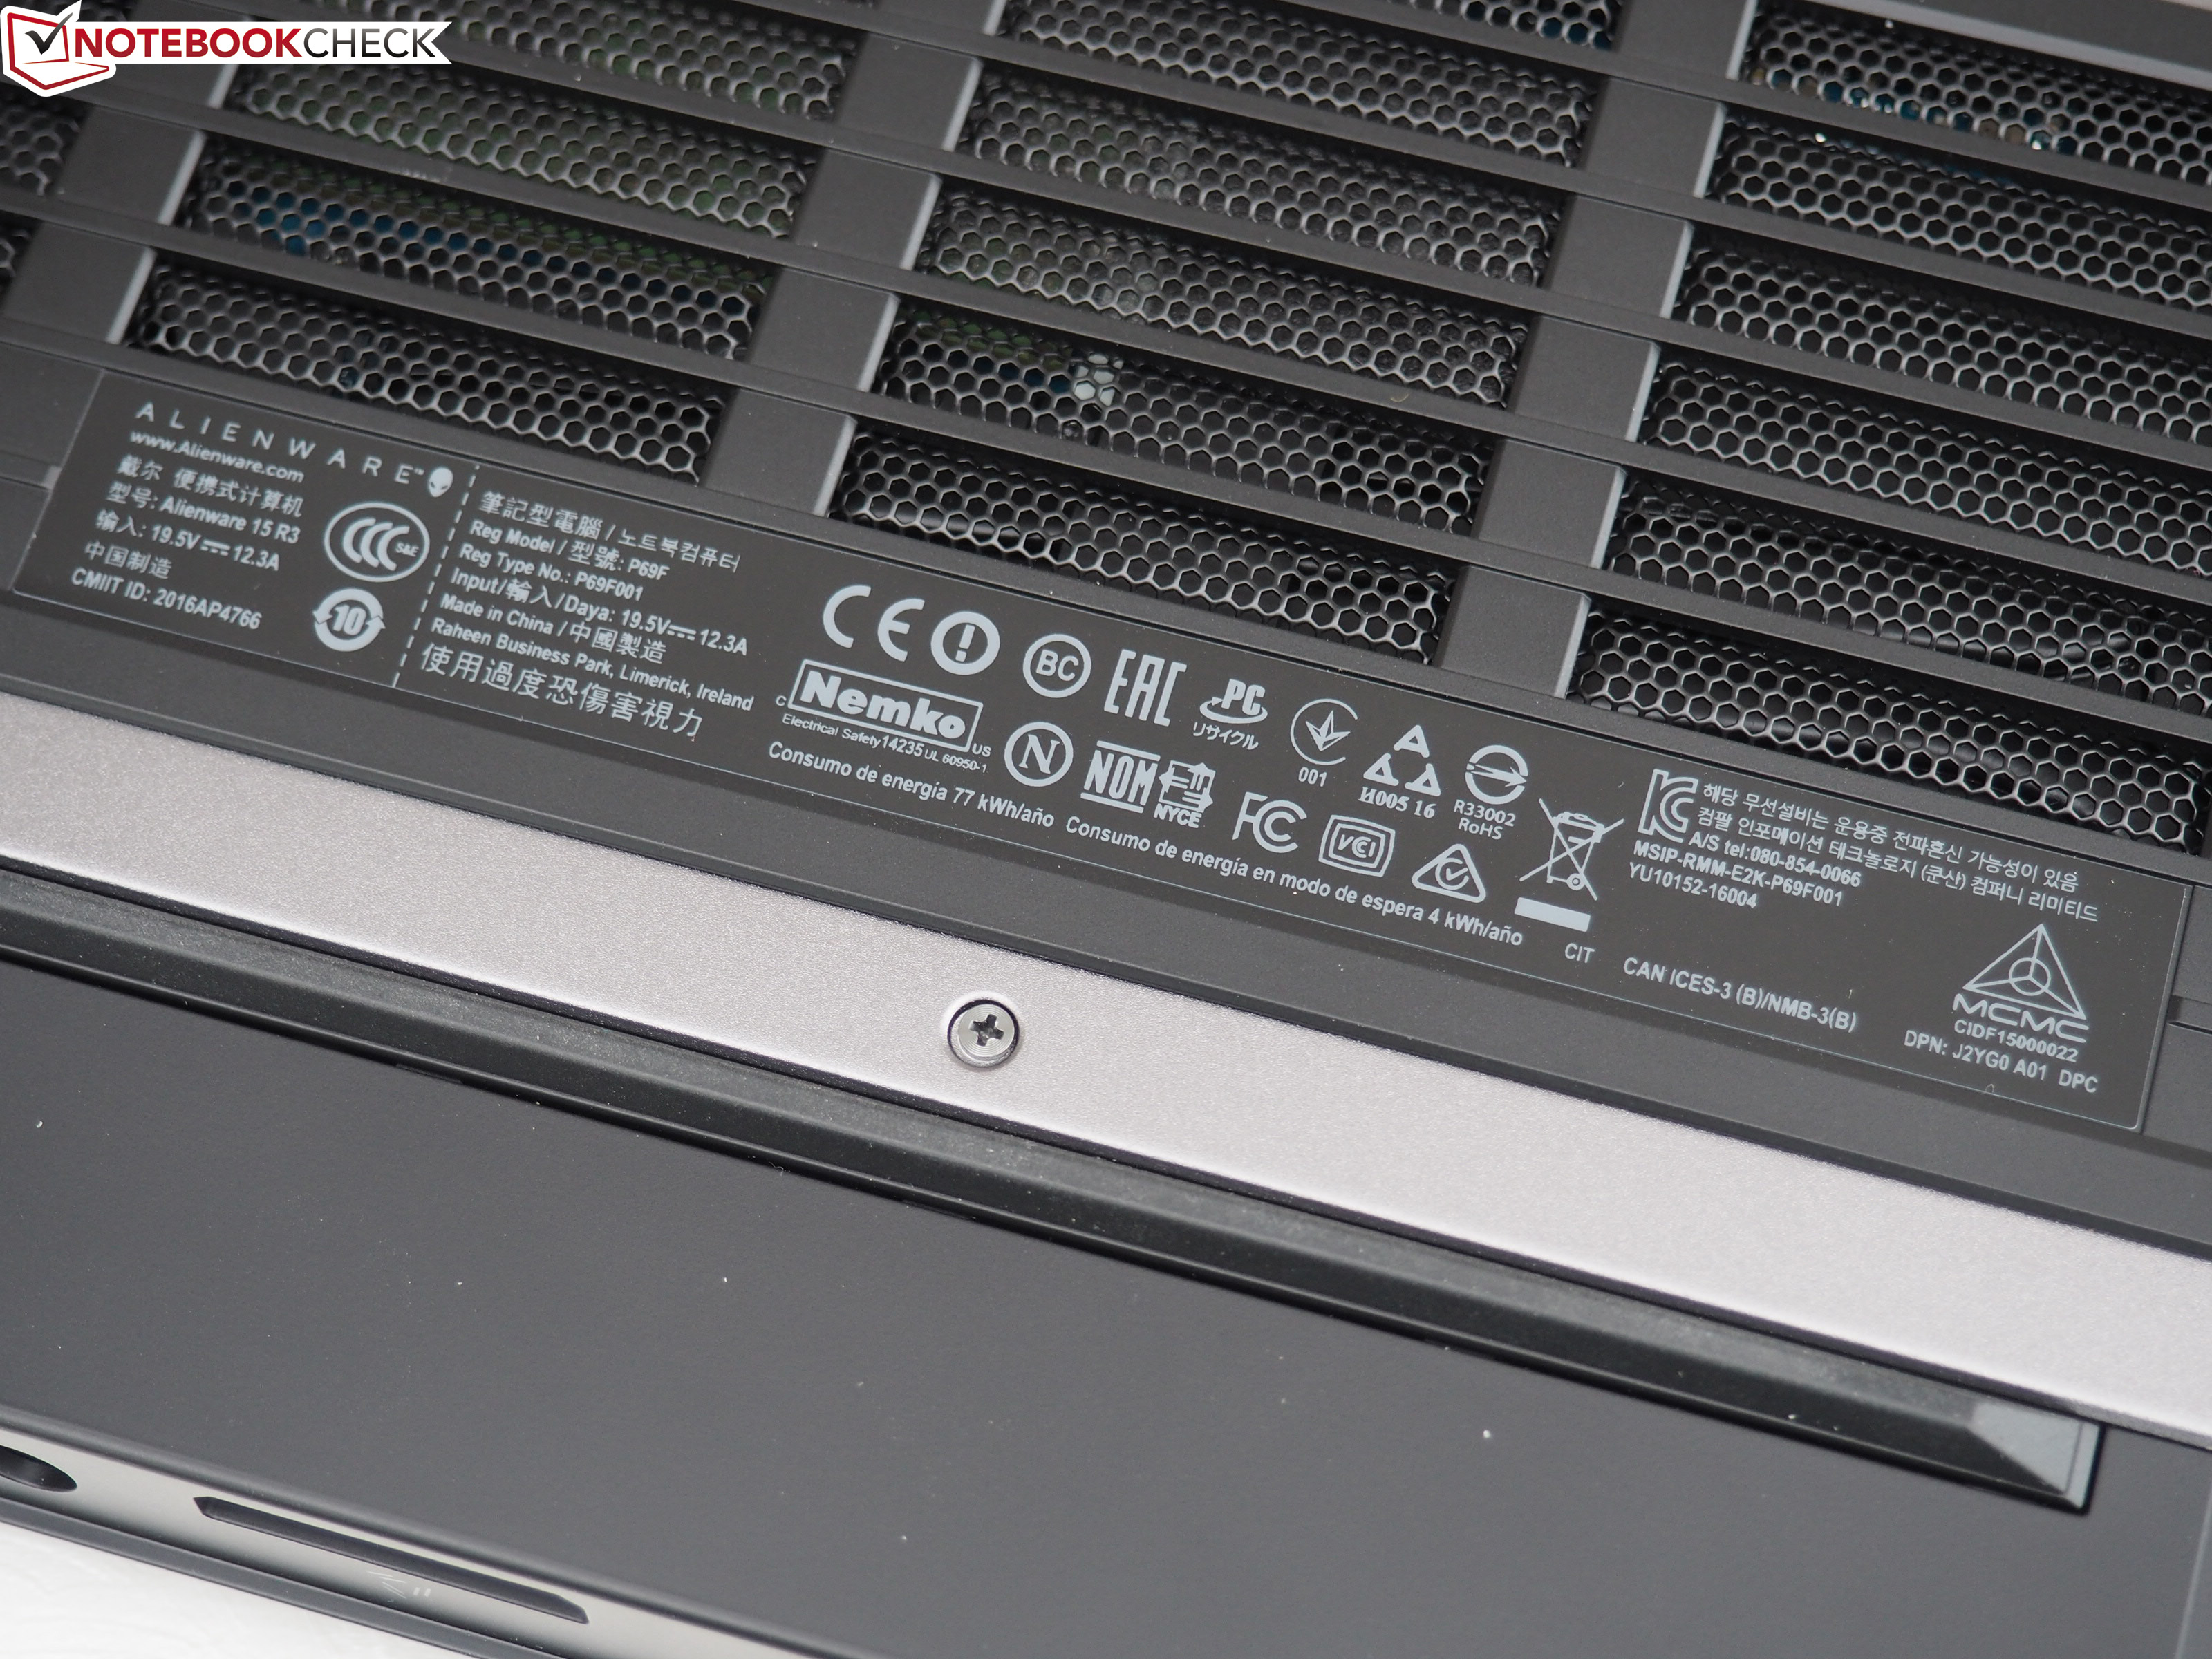 Alienware 15 R3 (i7-7820HK, GTX 1080 Max-Q, Full-HD) Laptop Review